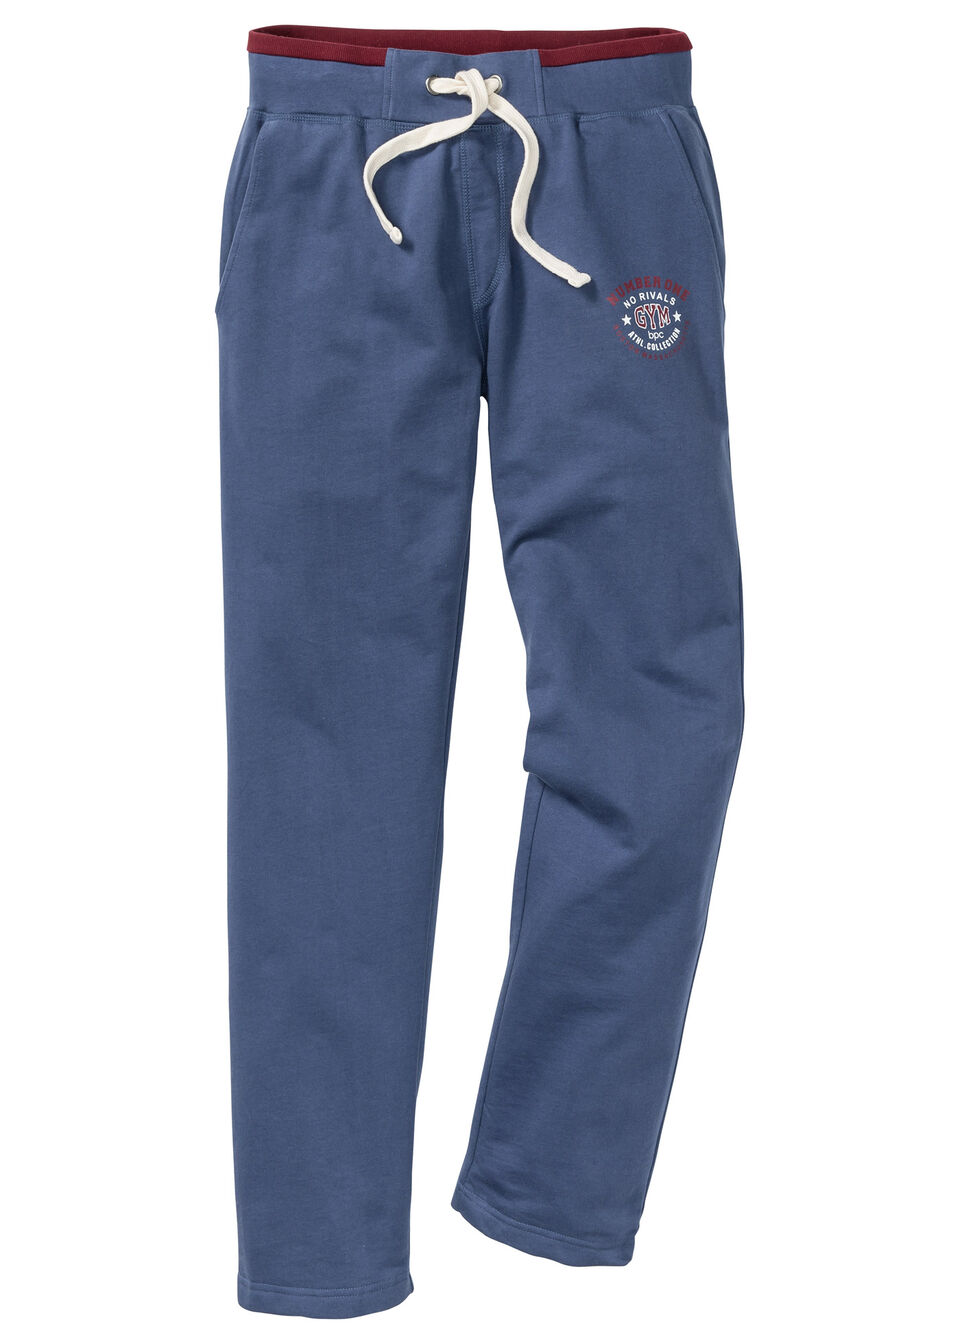 Pantaloni jogg cu print bonprix